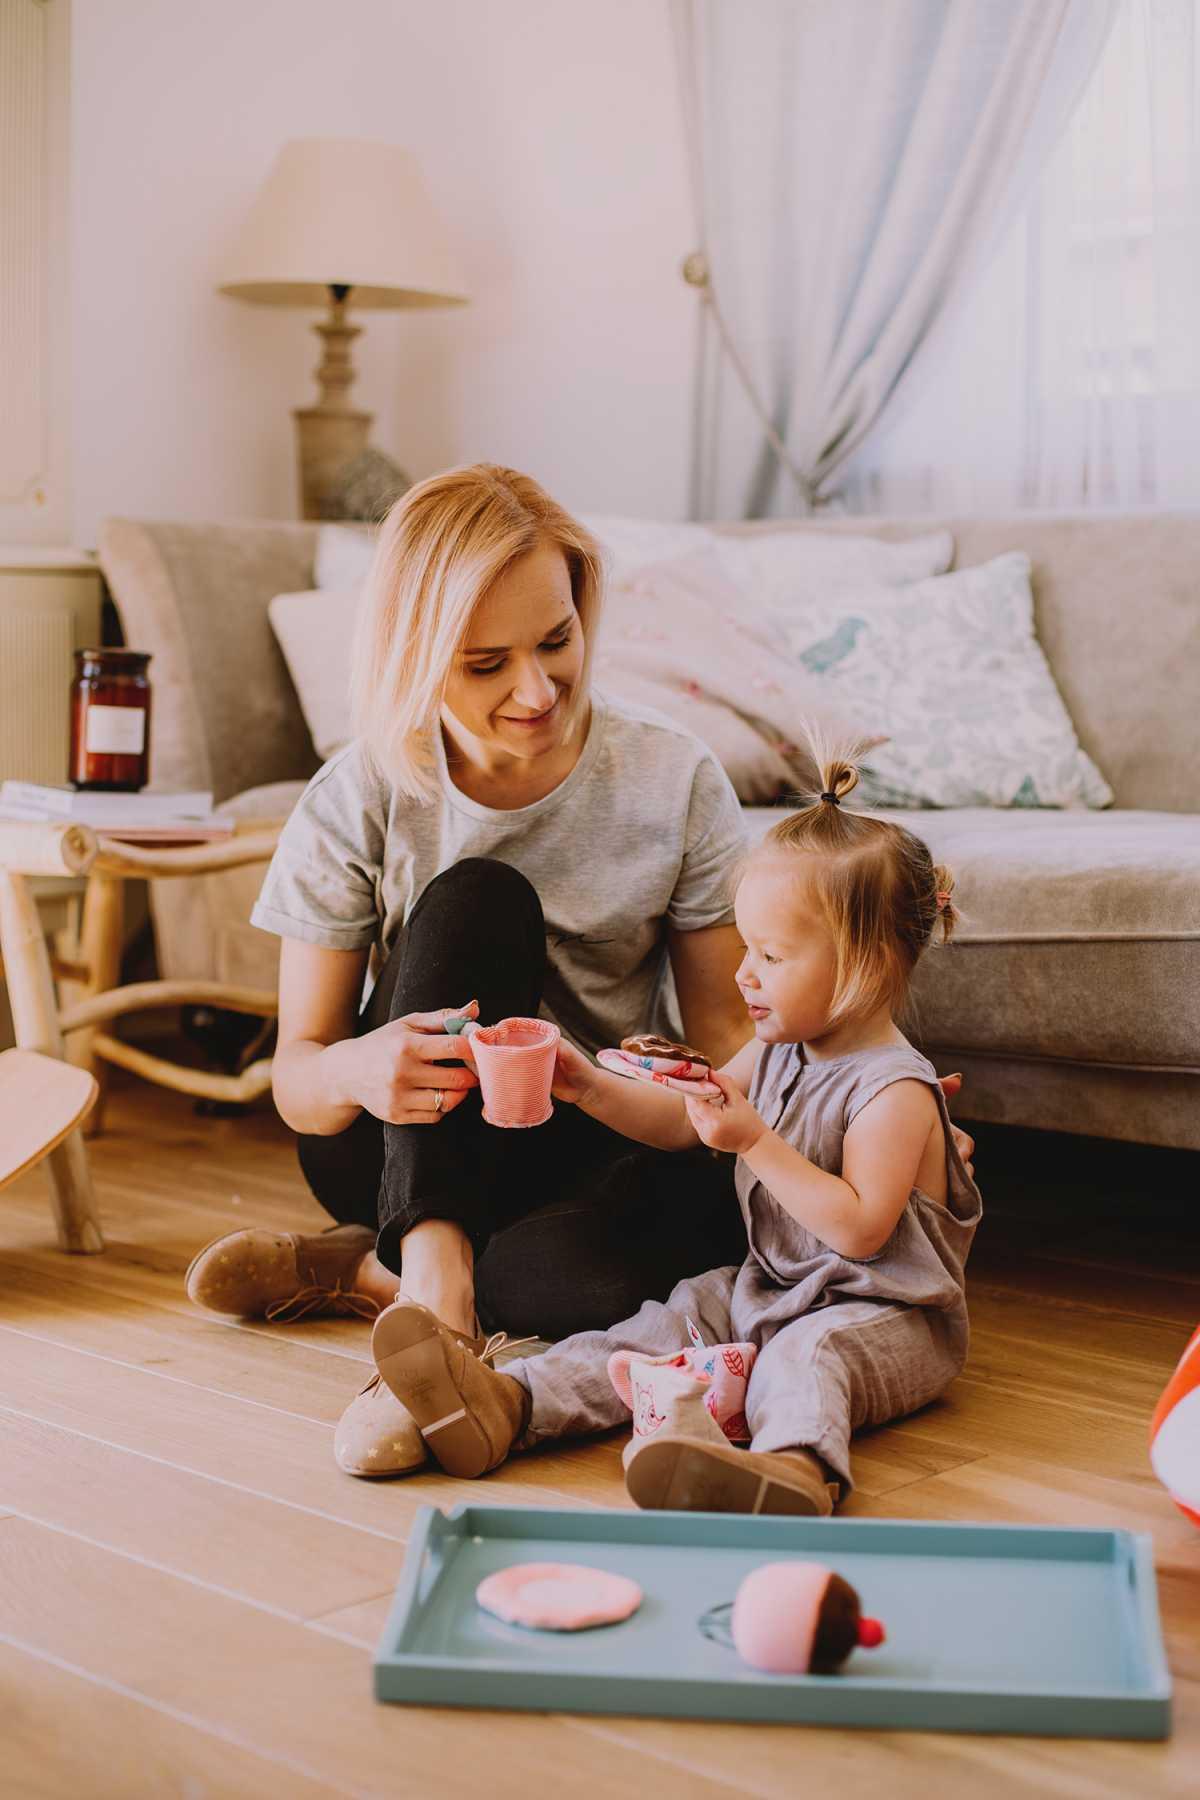 Bogna Bojanowska redaktor naczelna Mint z córką Zoe, tea time